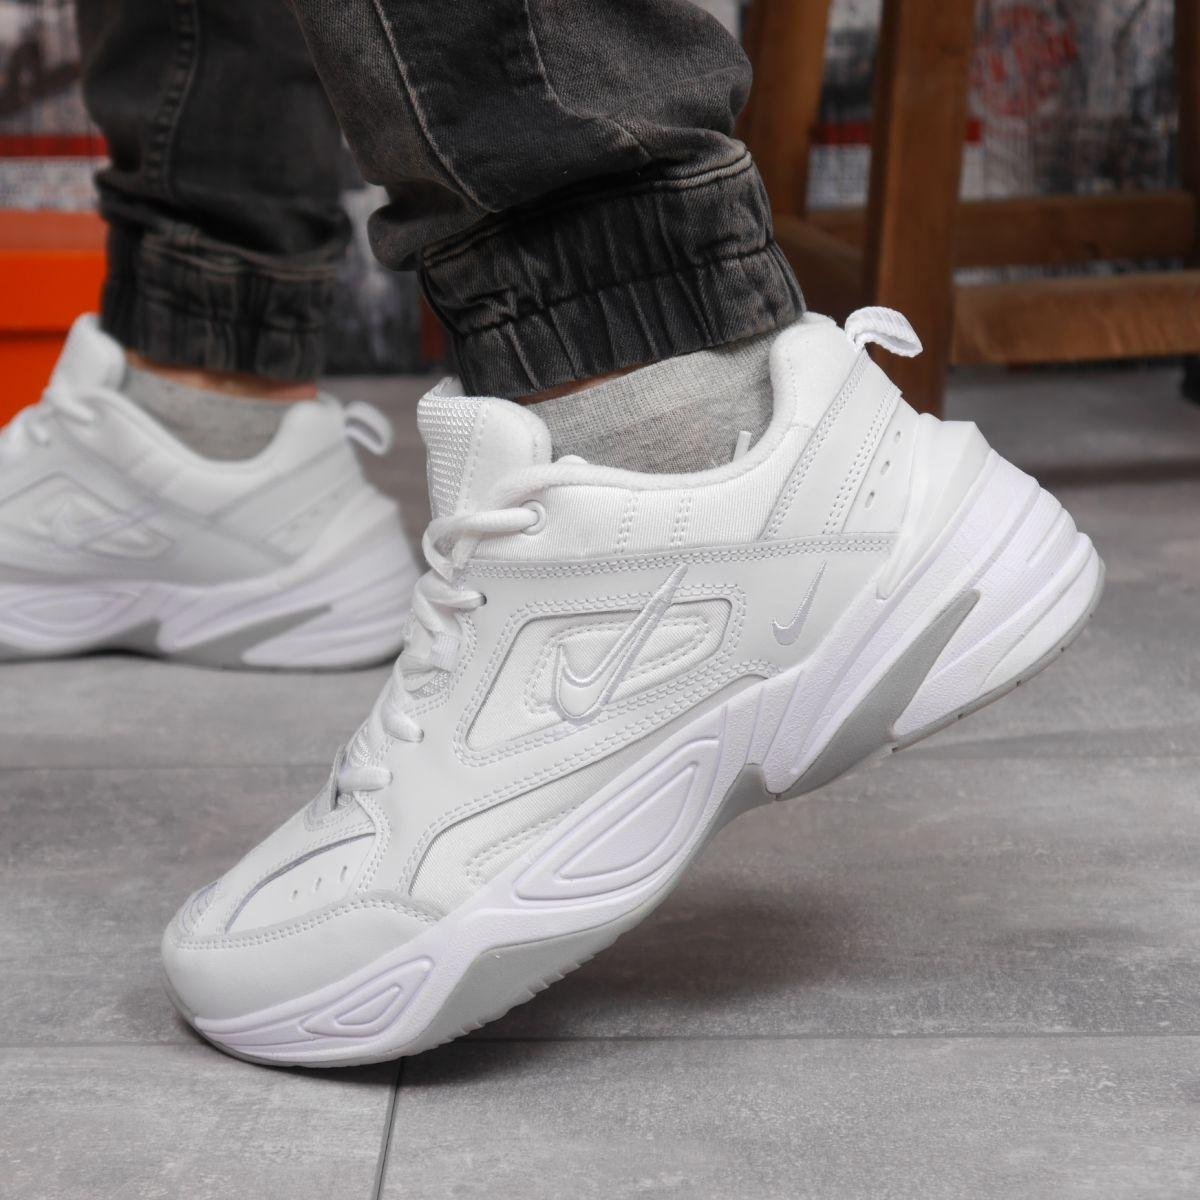 Кроссовки мужские 18201, Nike M2K Tekno, белые, [ 41 42 43 44 45 46 ] р. 41-26,2см.